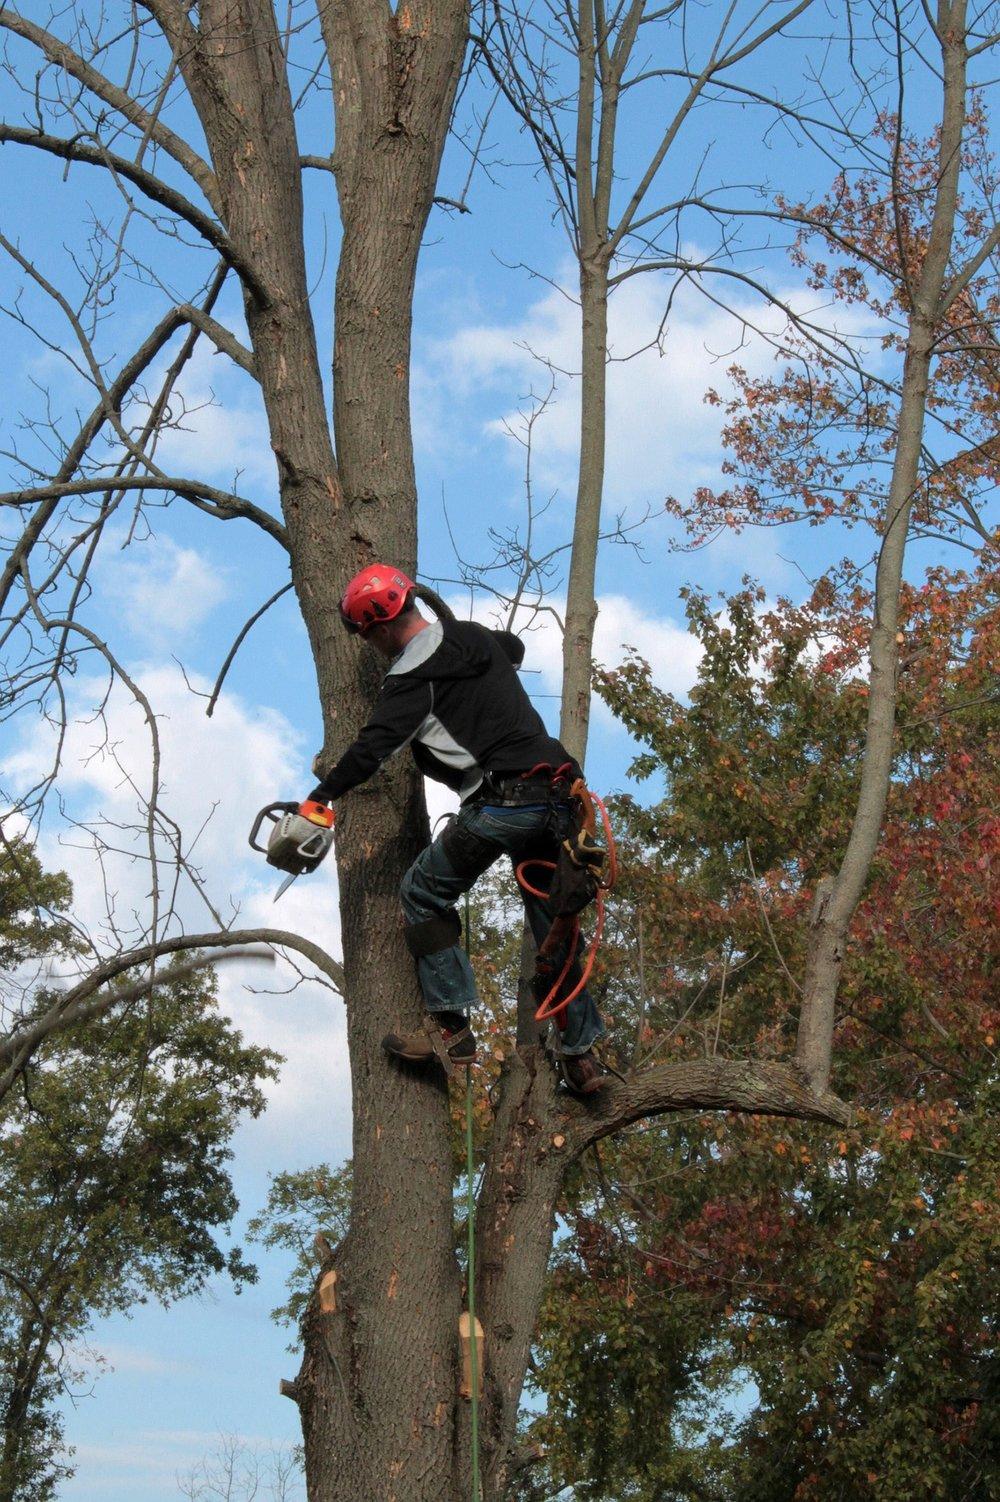 tree-1059416_1920.jpg